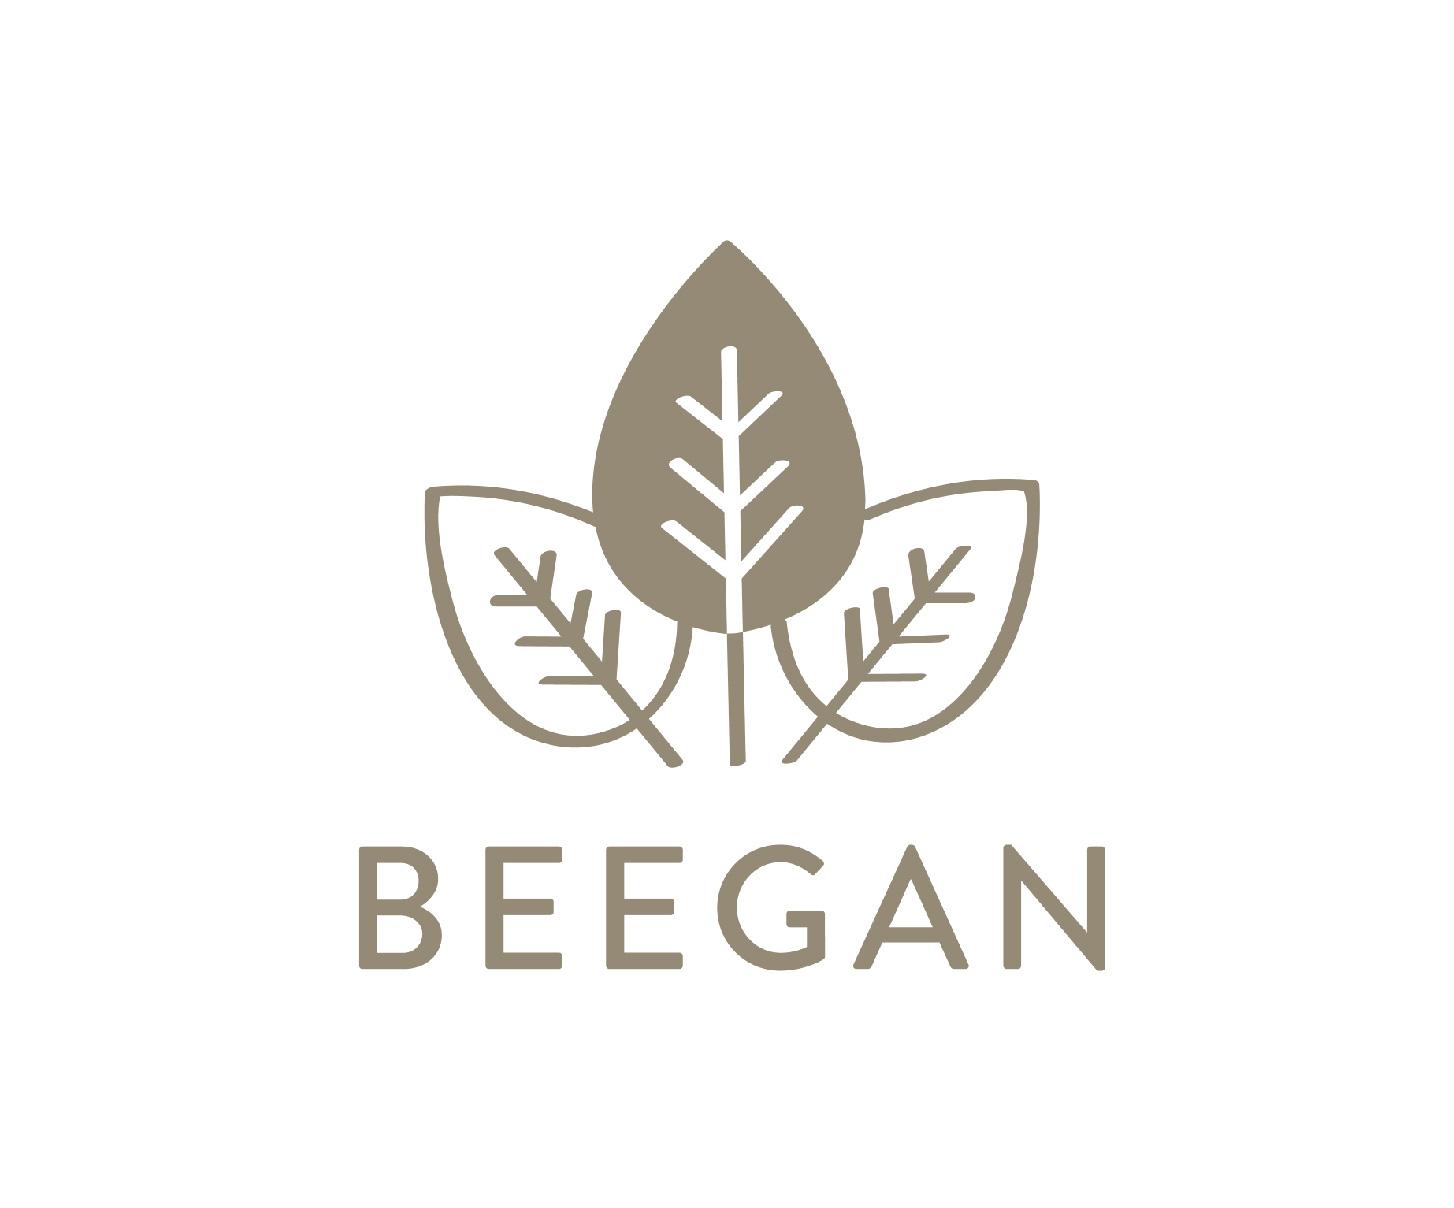 Beegan